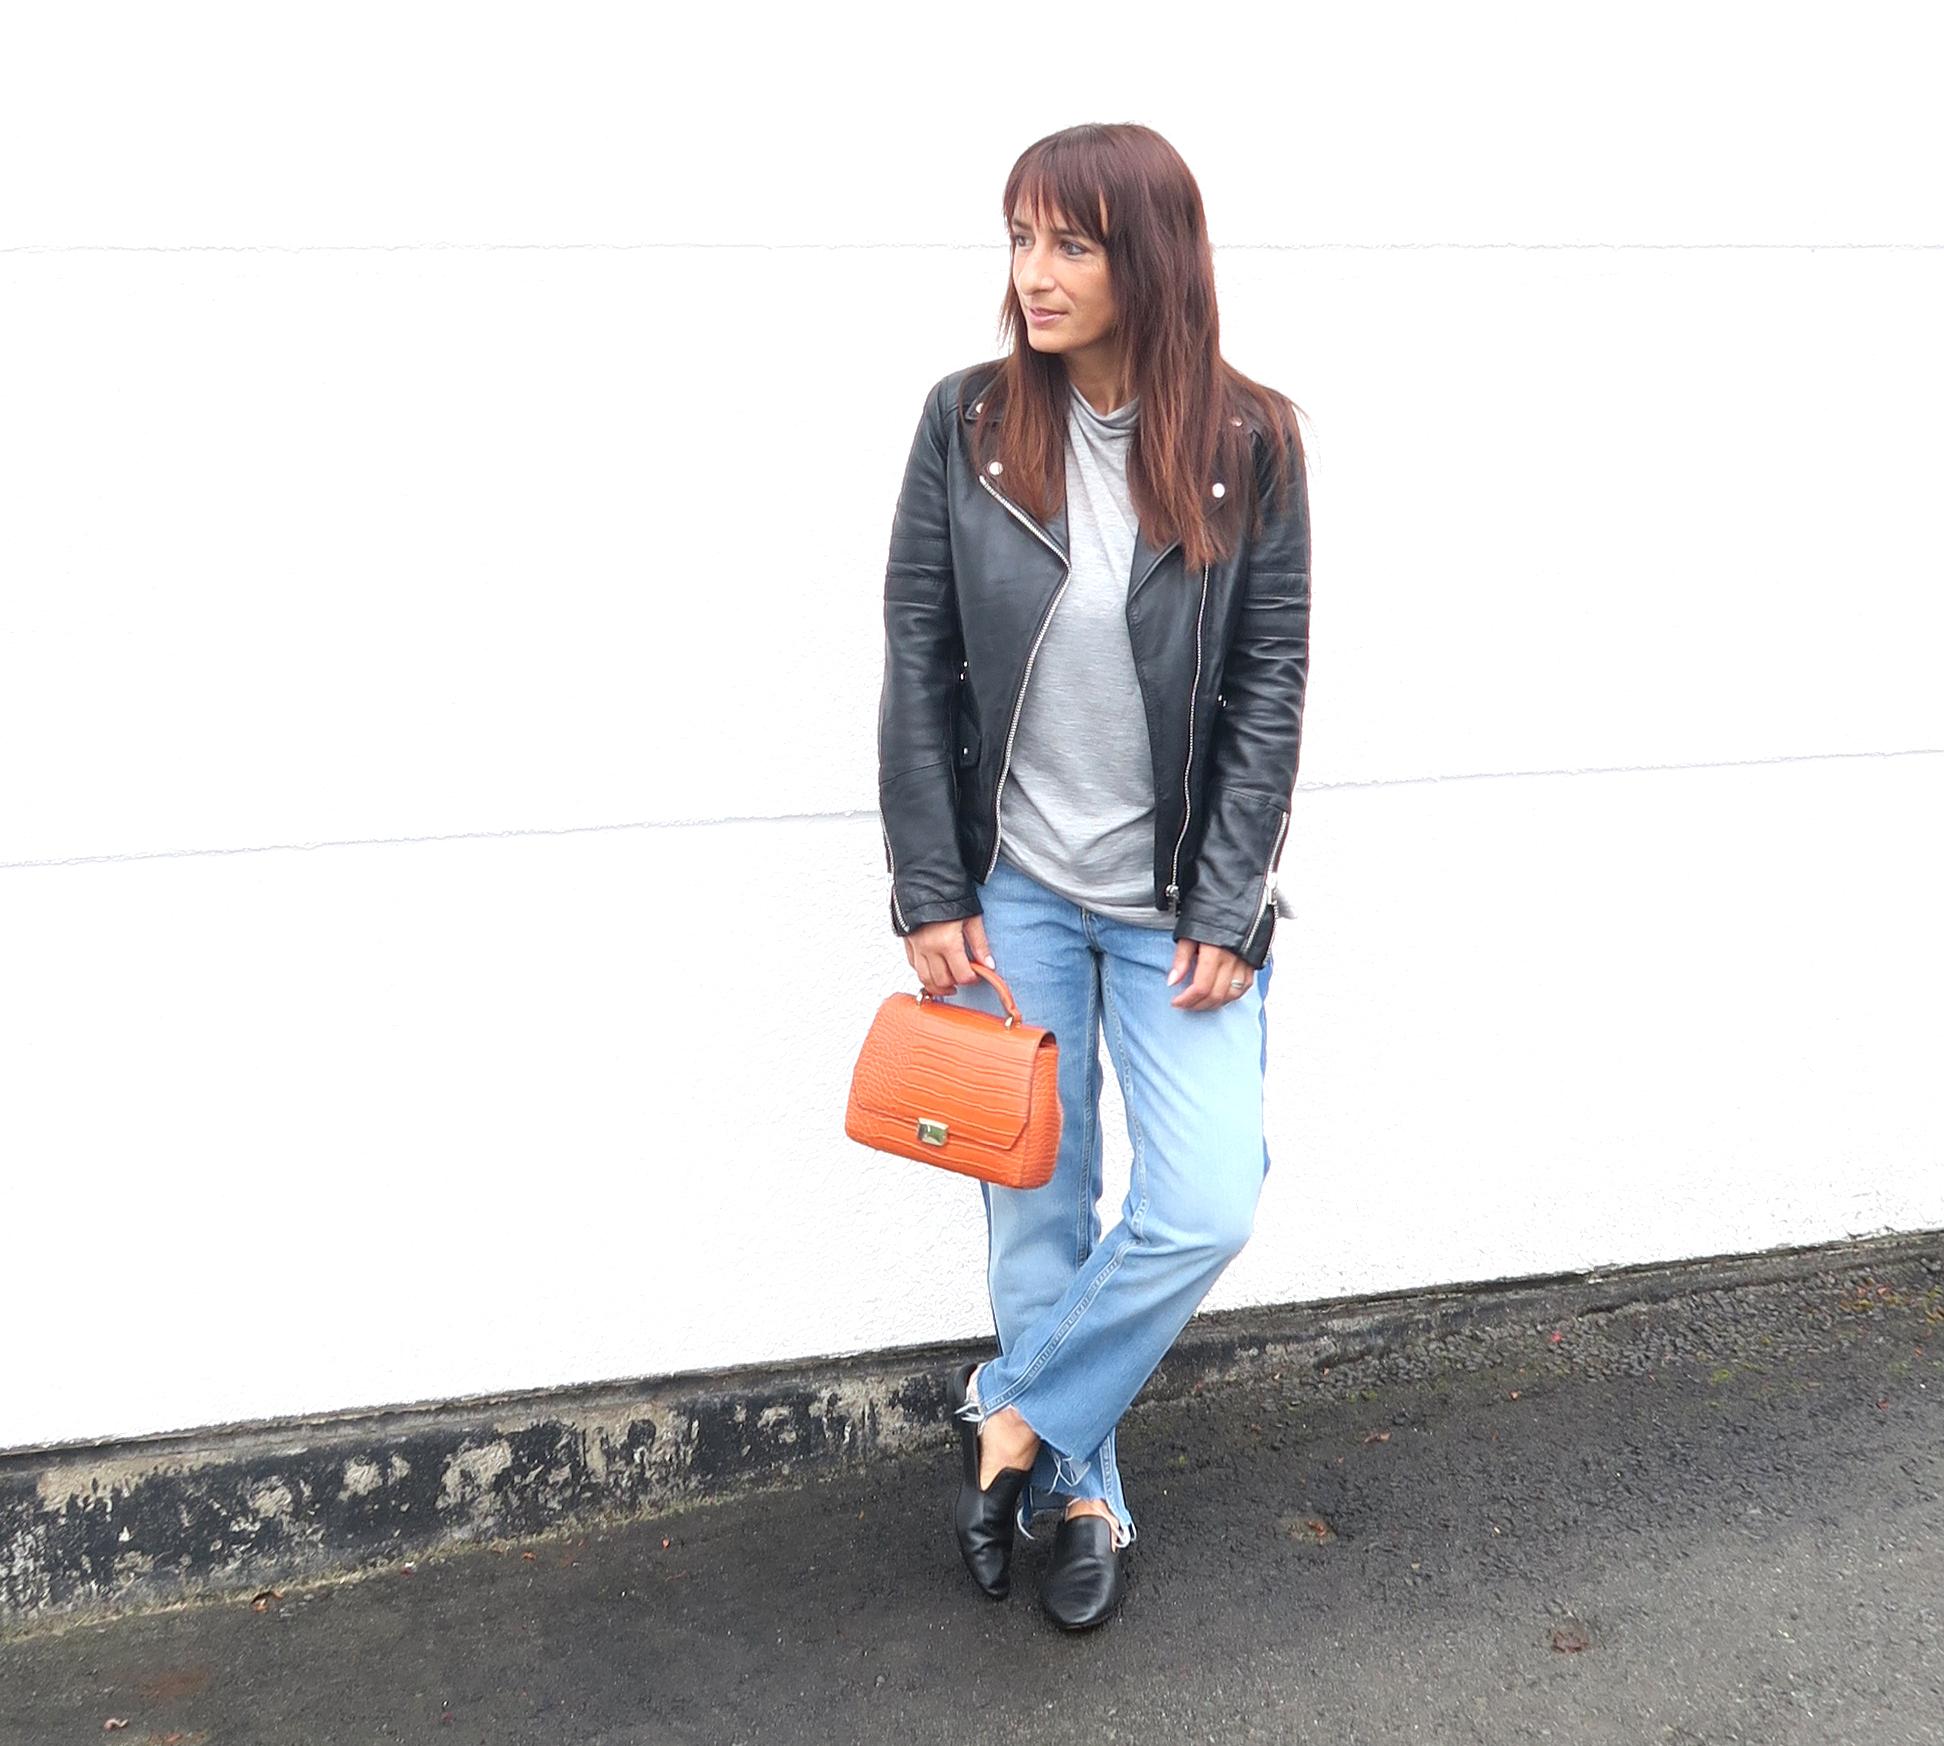 Streetstyle-Blogger-Modesalat-Style-Fashion-Streetfashion7